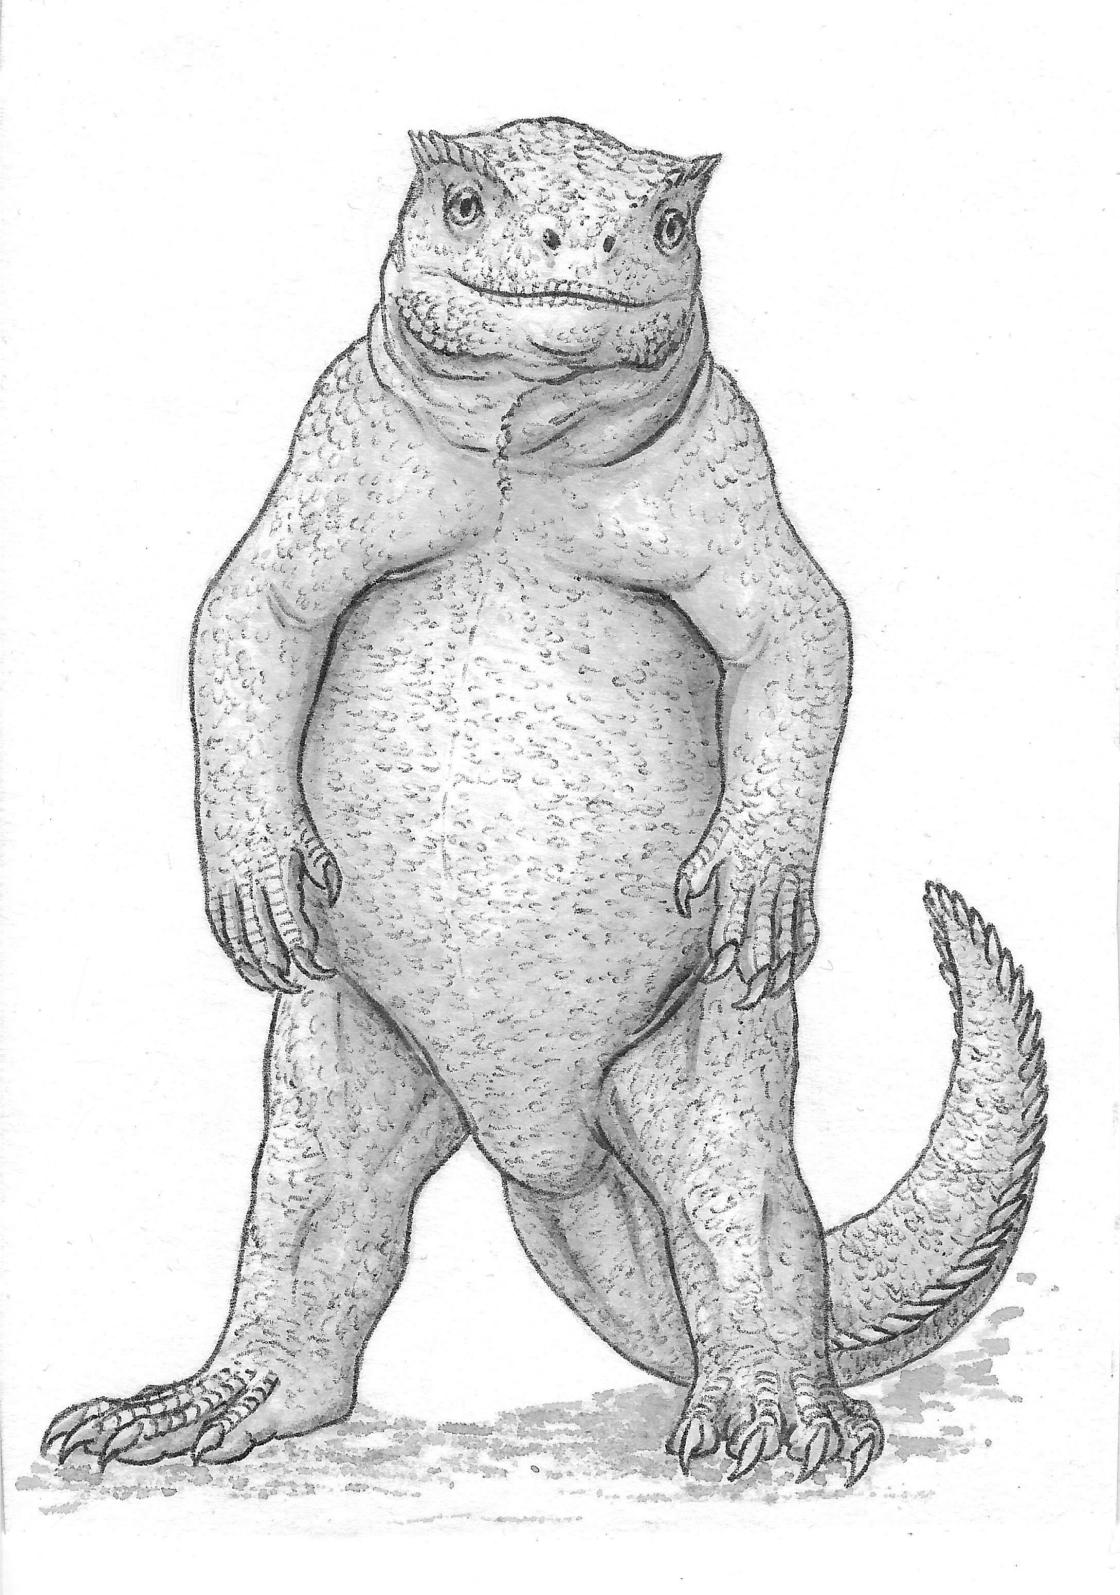 Chunky lizard guy